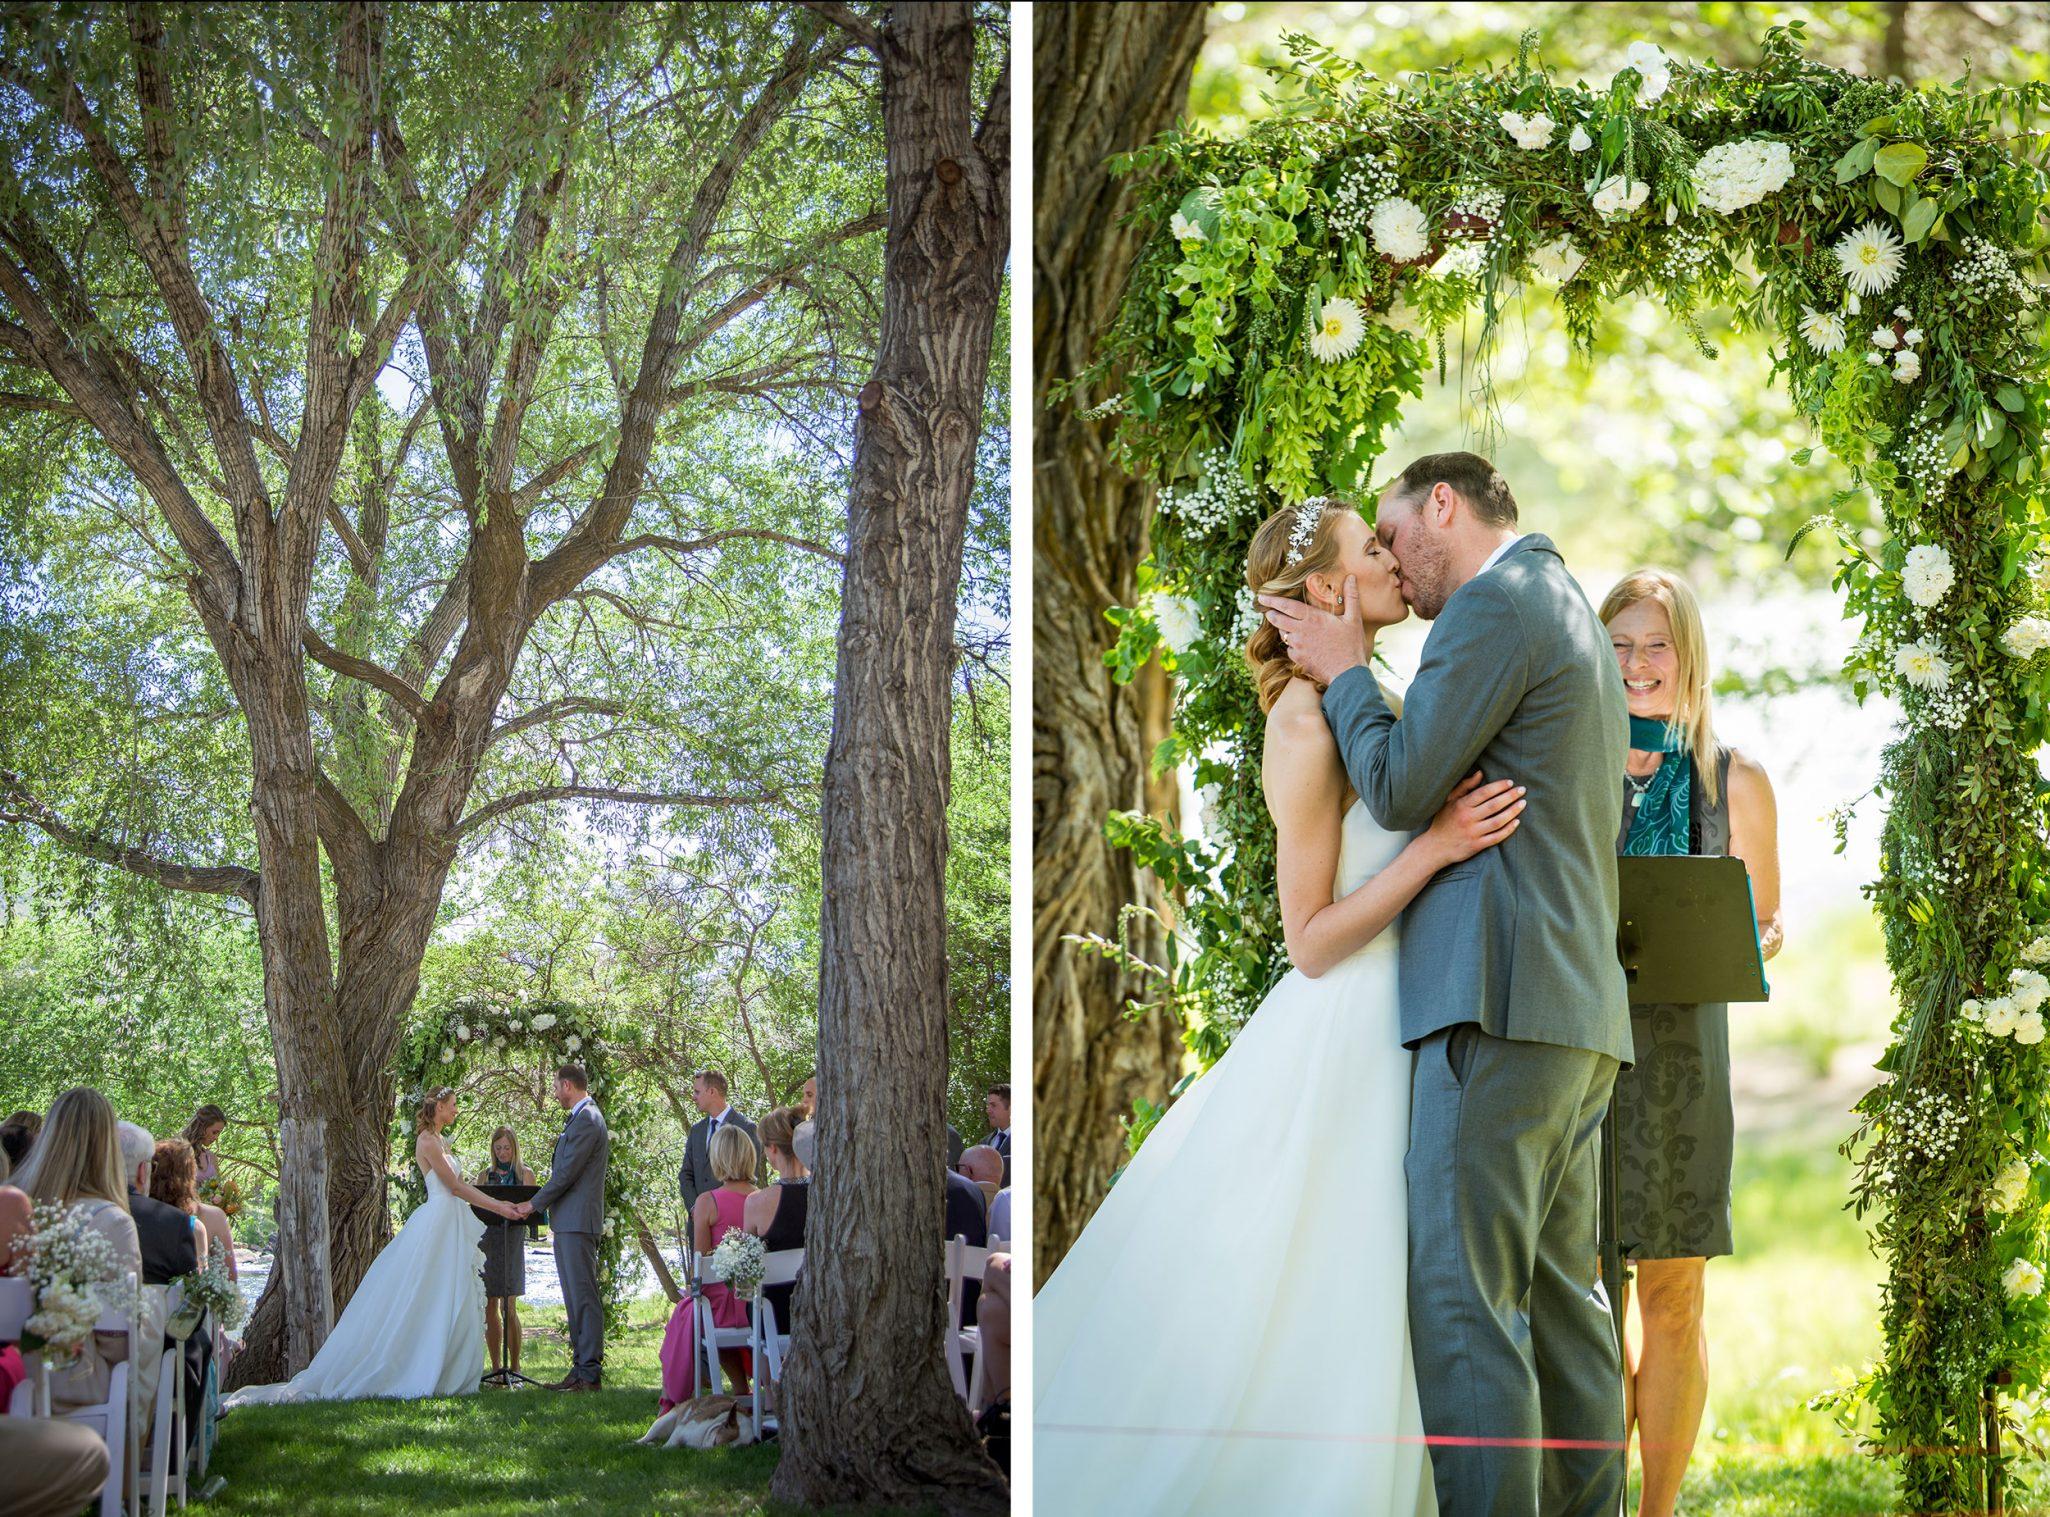 outdoor wedding ceremony via Durango Weddings Magazine